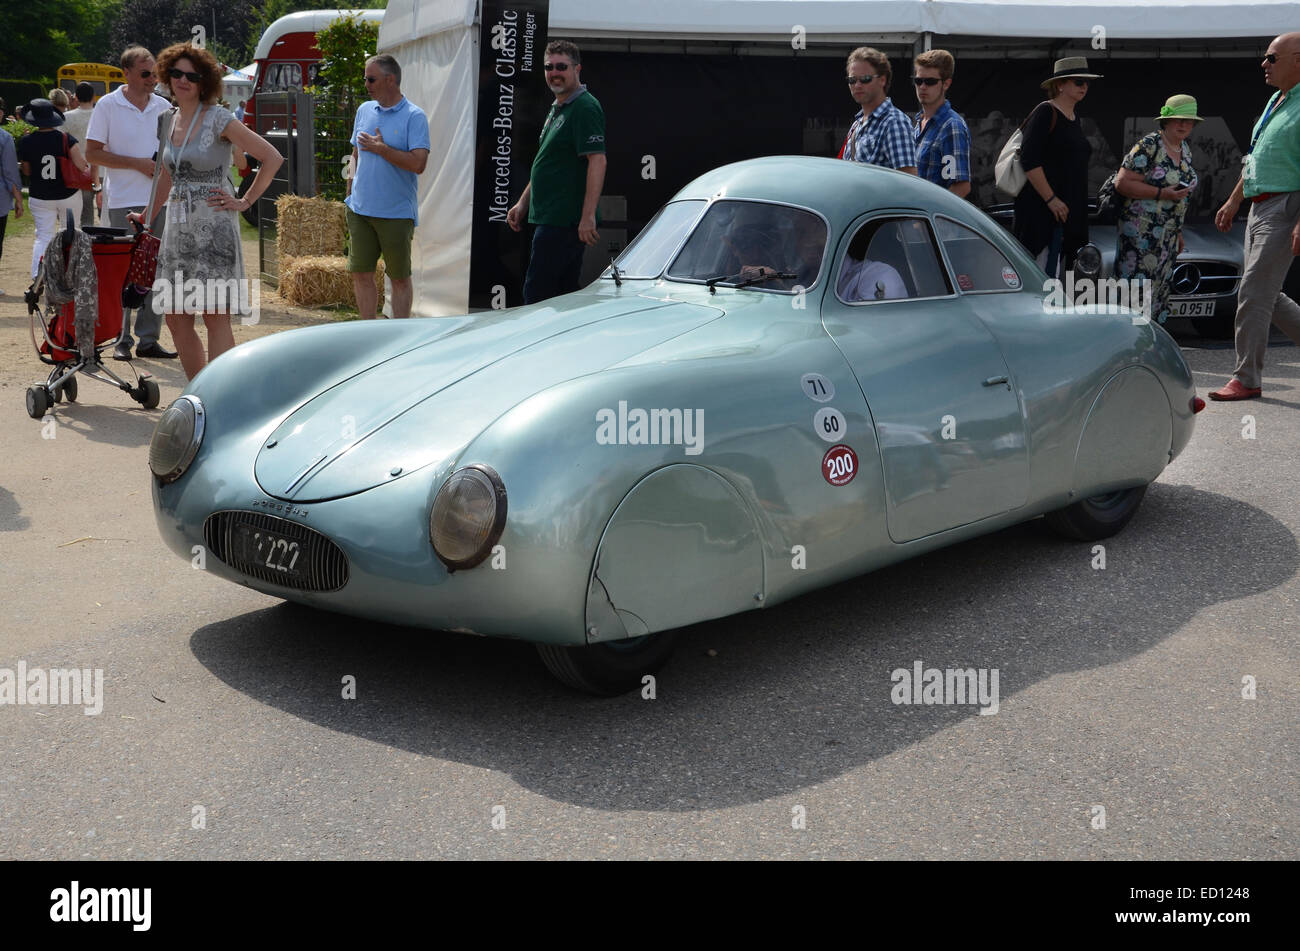 Porsche type 64 at Schloss Dyck Classic Days 2014, Germany - Stock Image